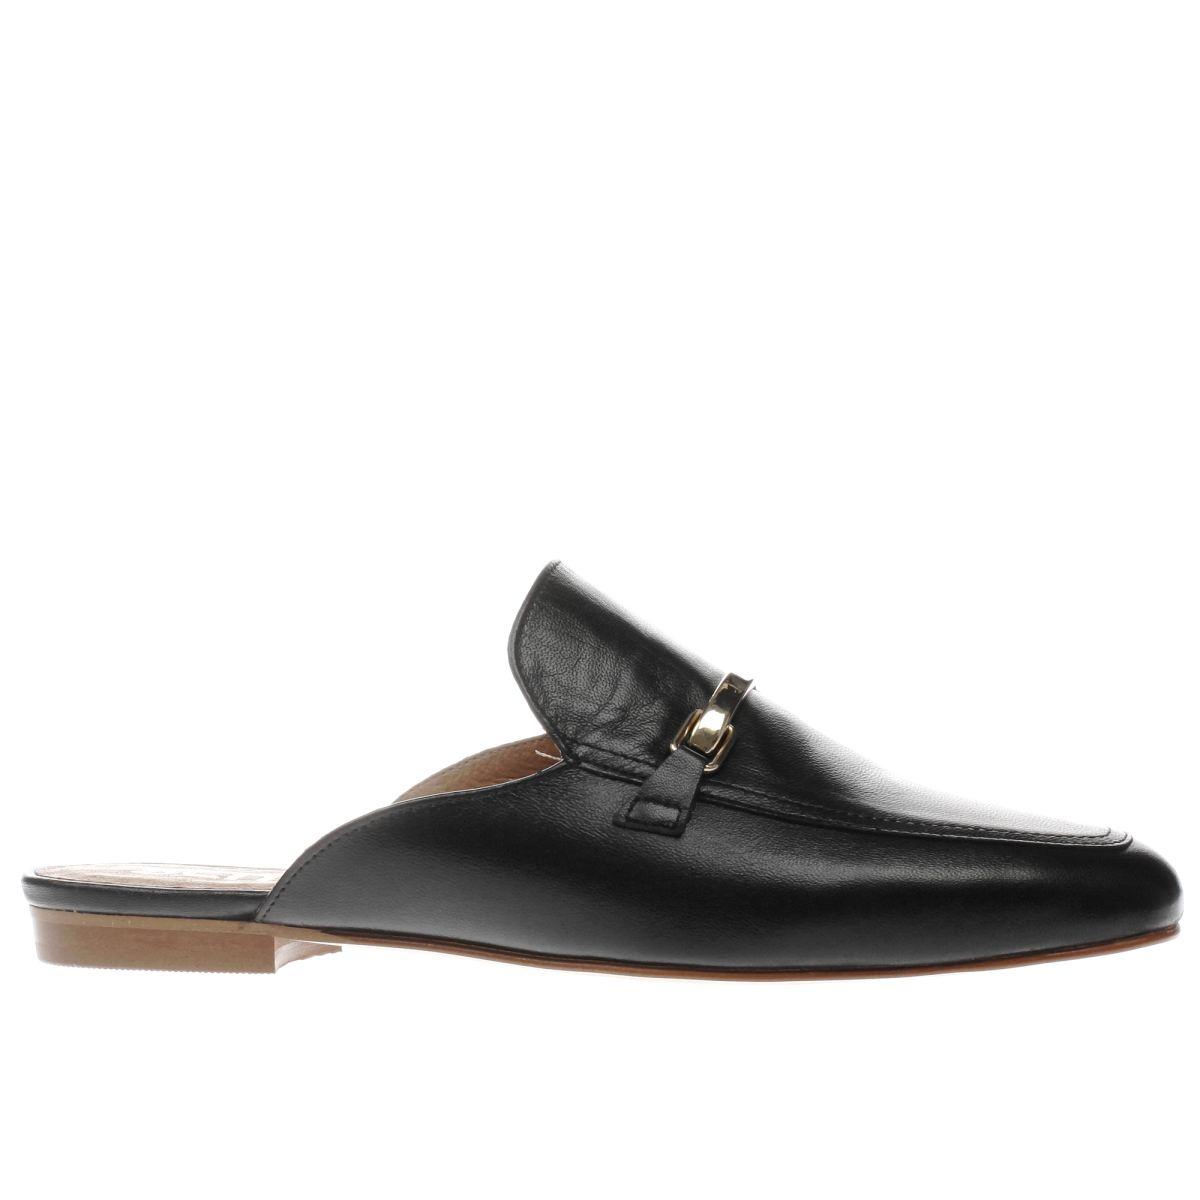 schuh black ritzy flat shoes